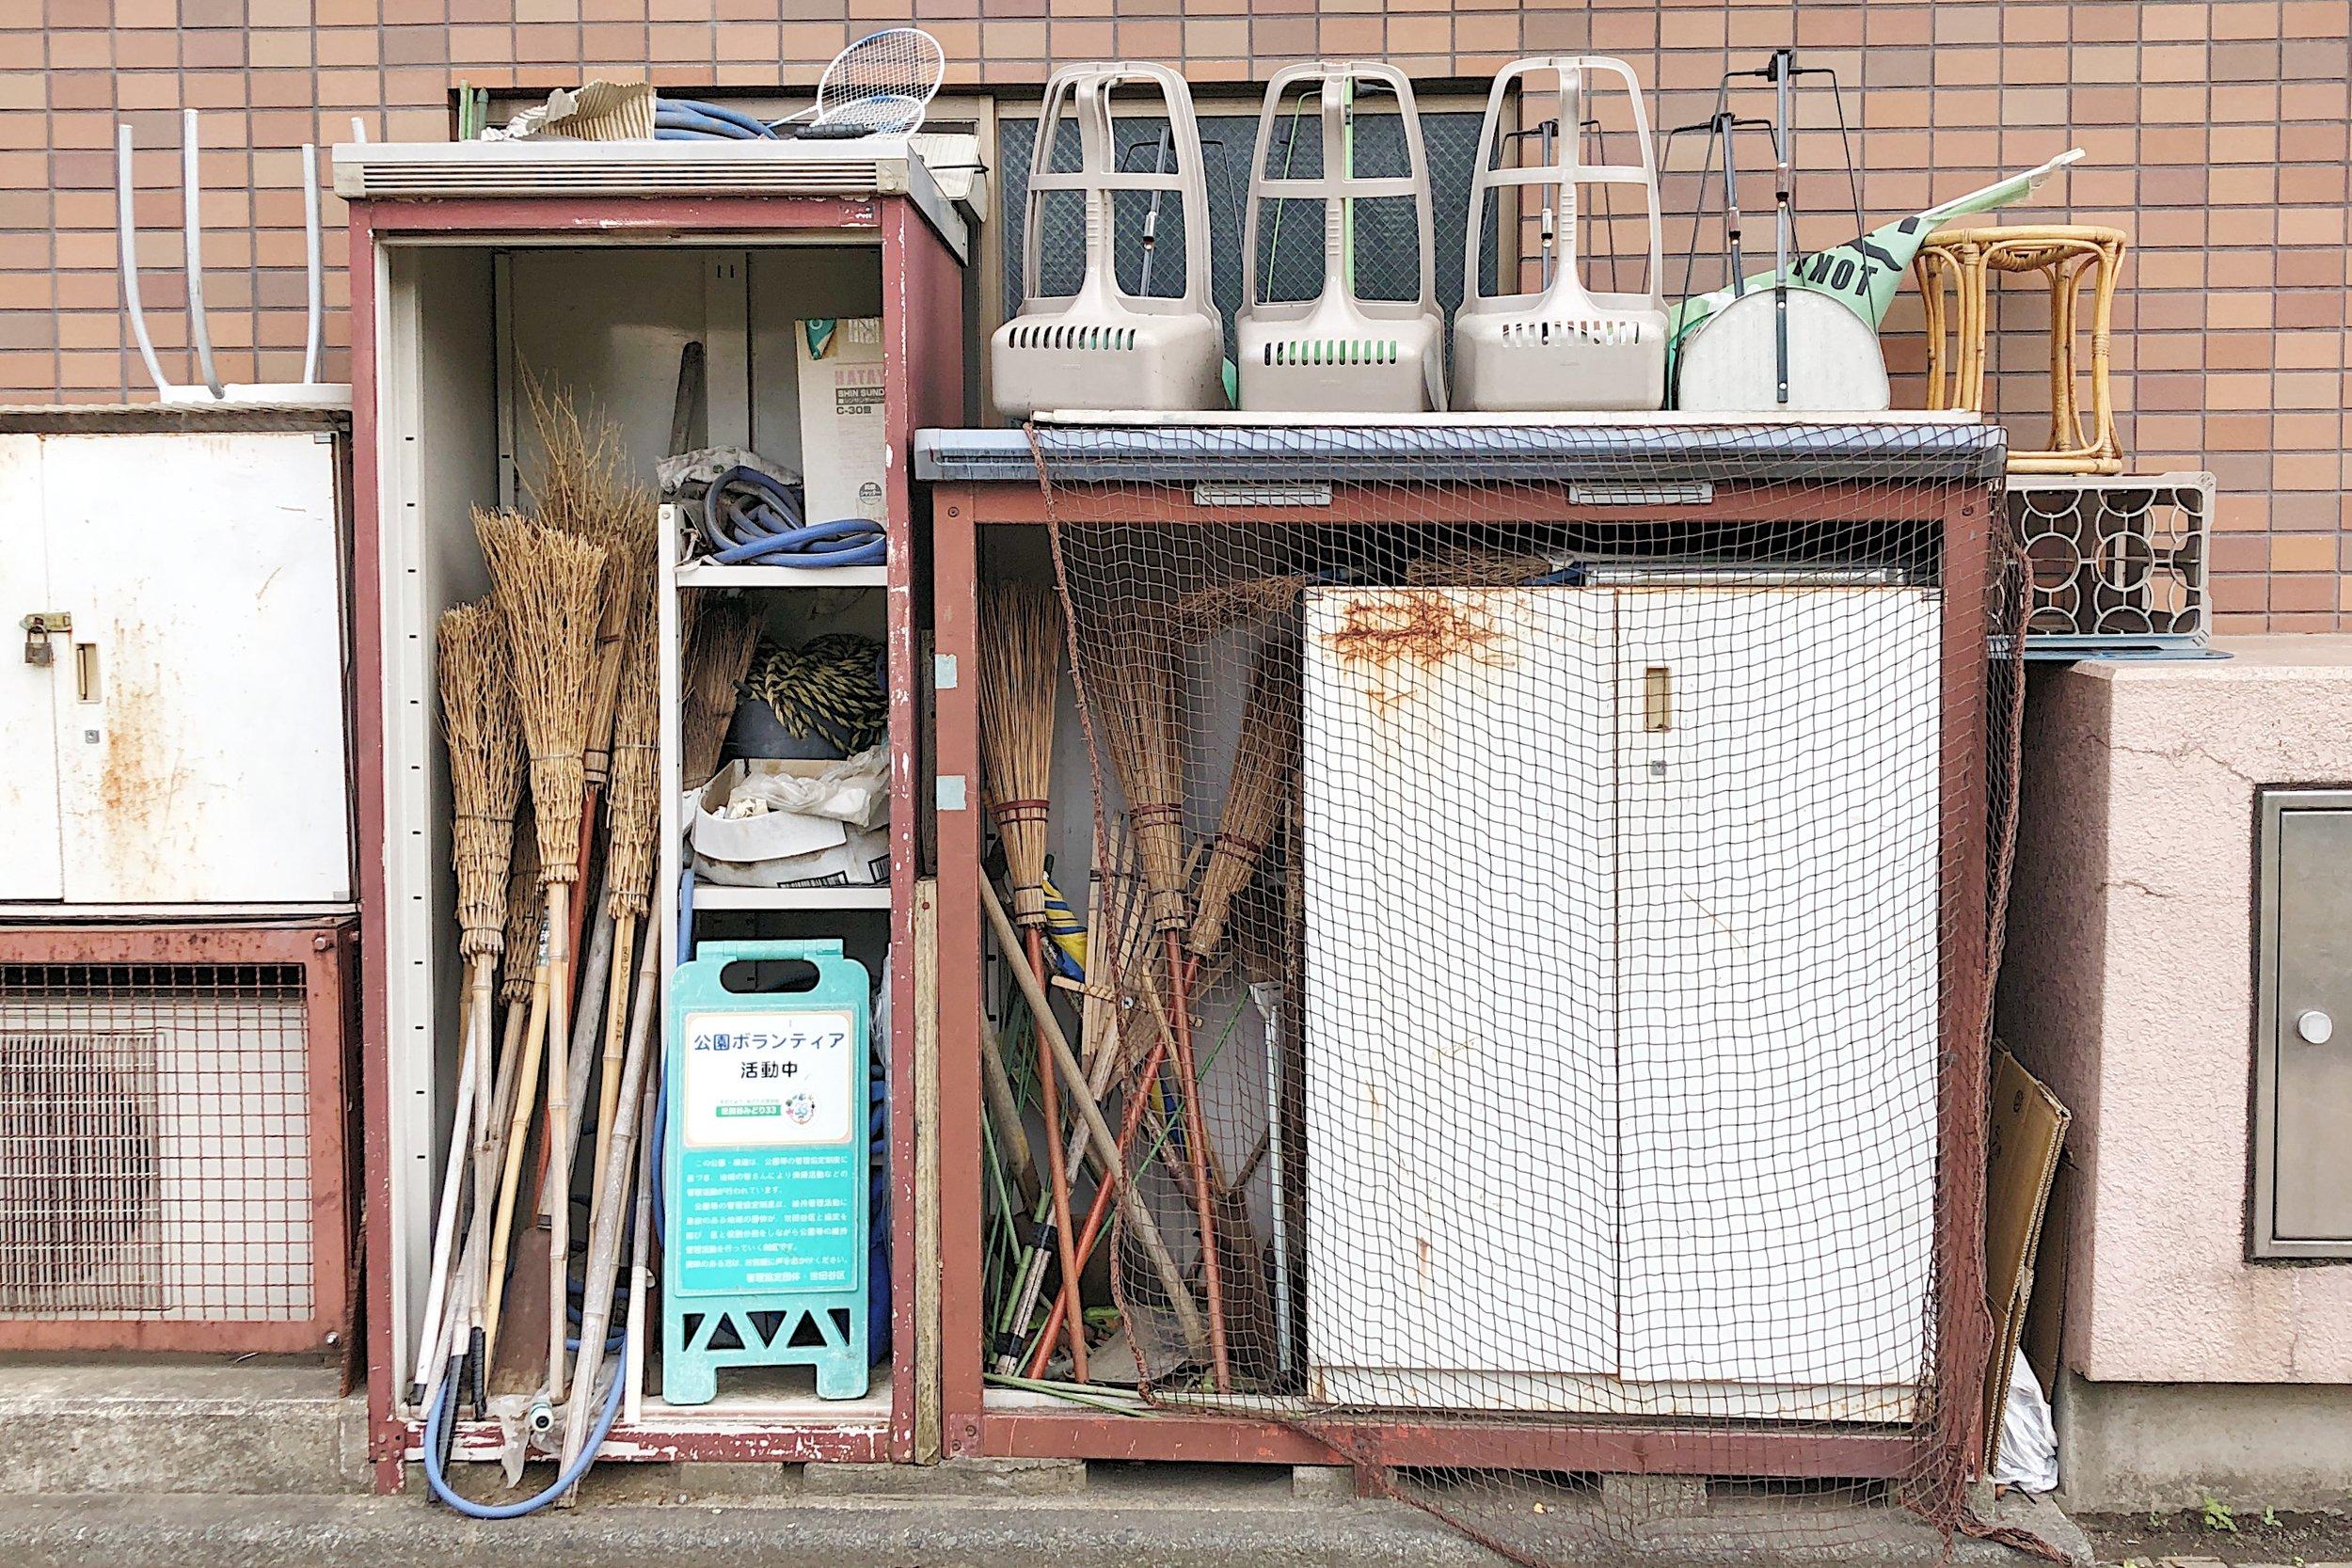 Super Ordinary Life Tokyo Brooms 3.JPG